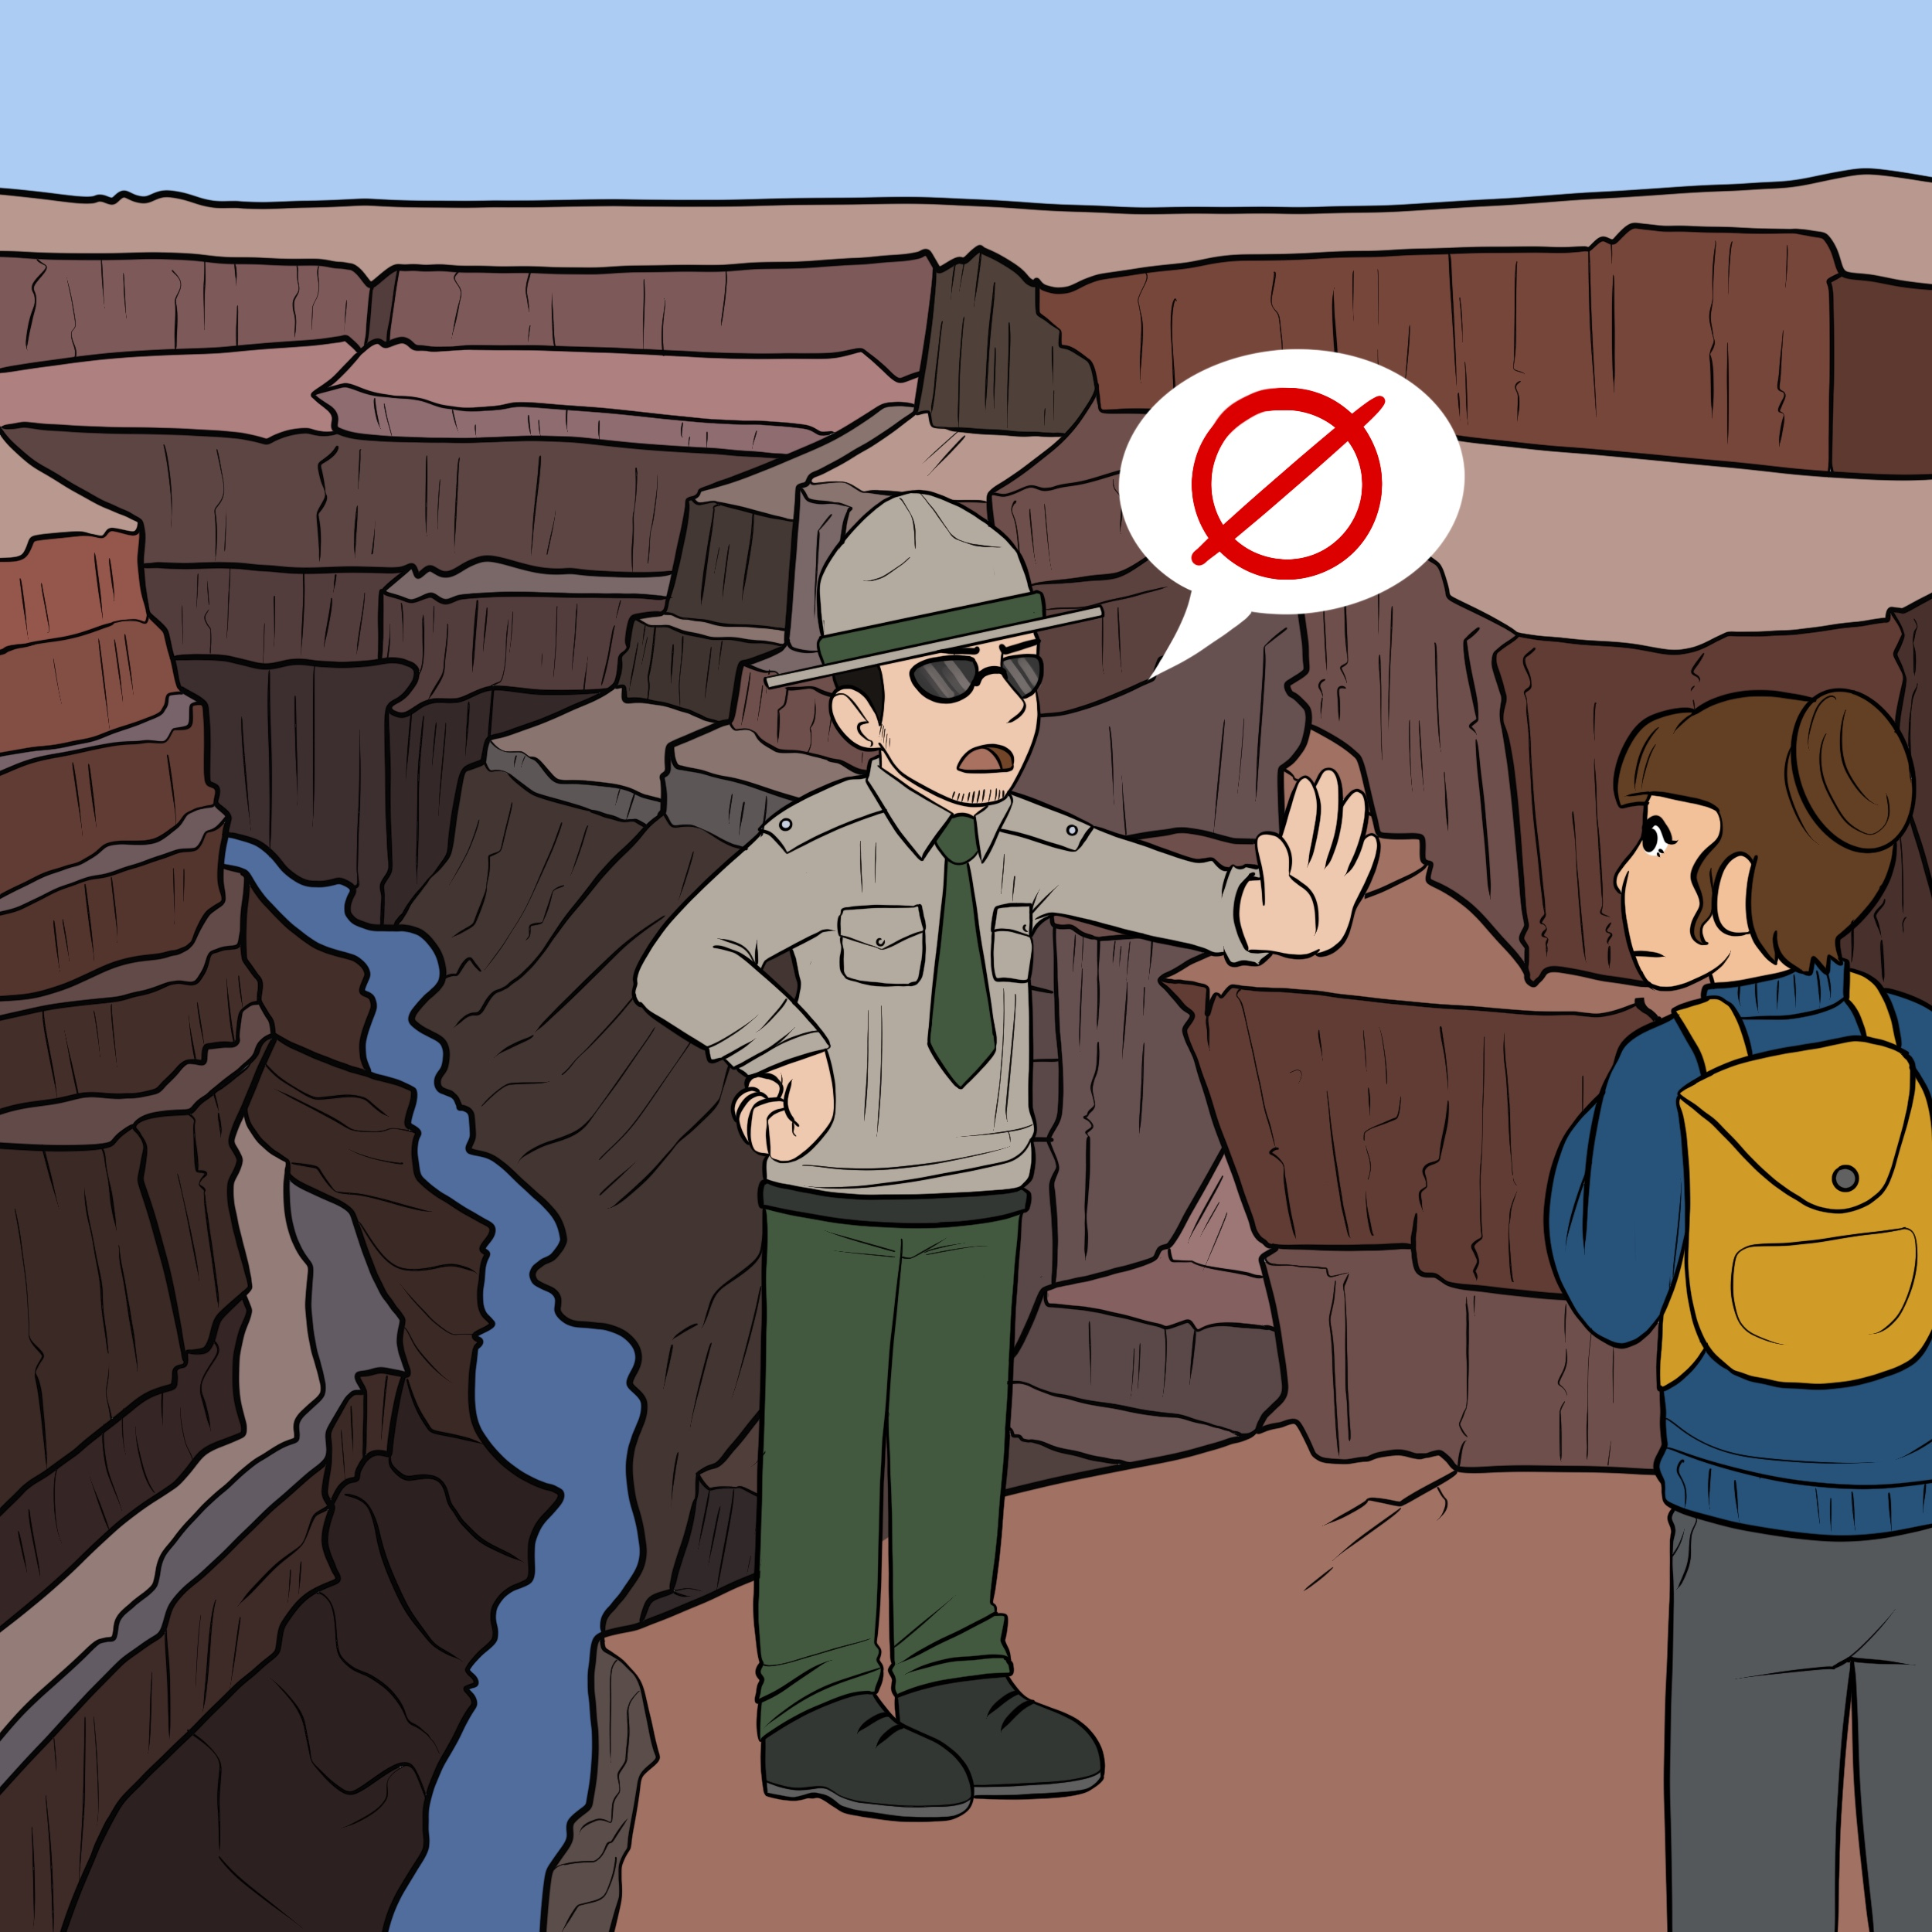 Protecting the Gem of Arizona